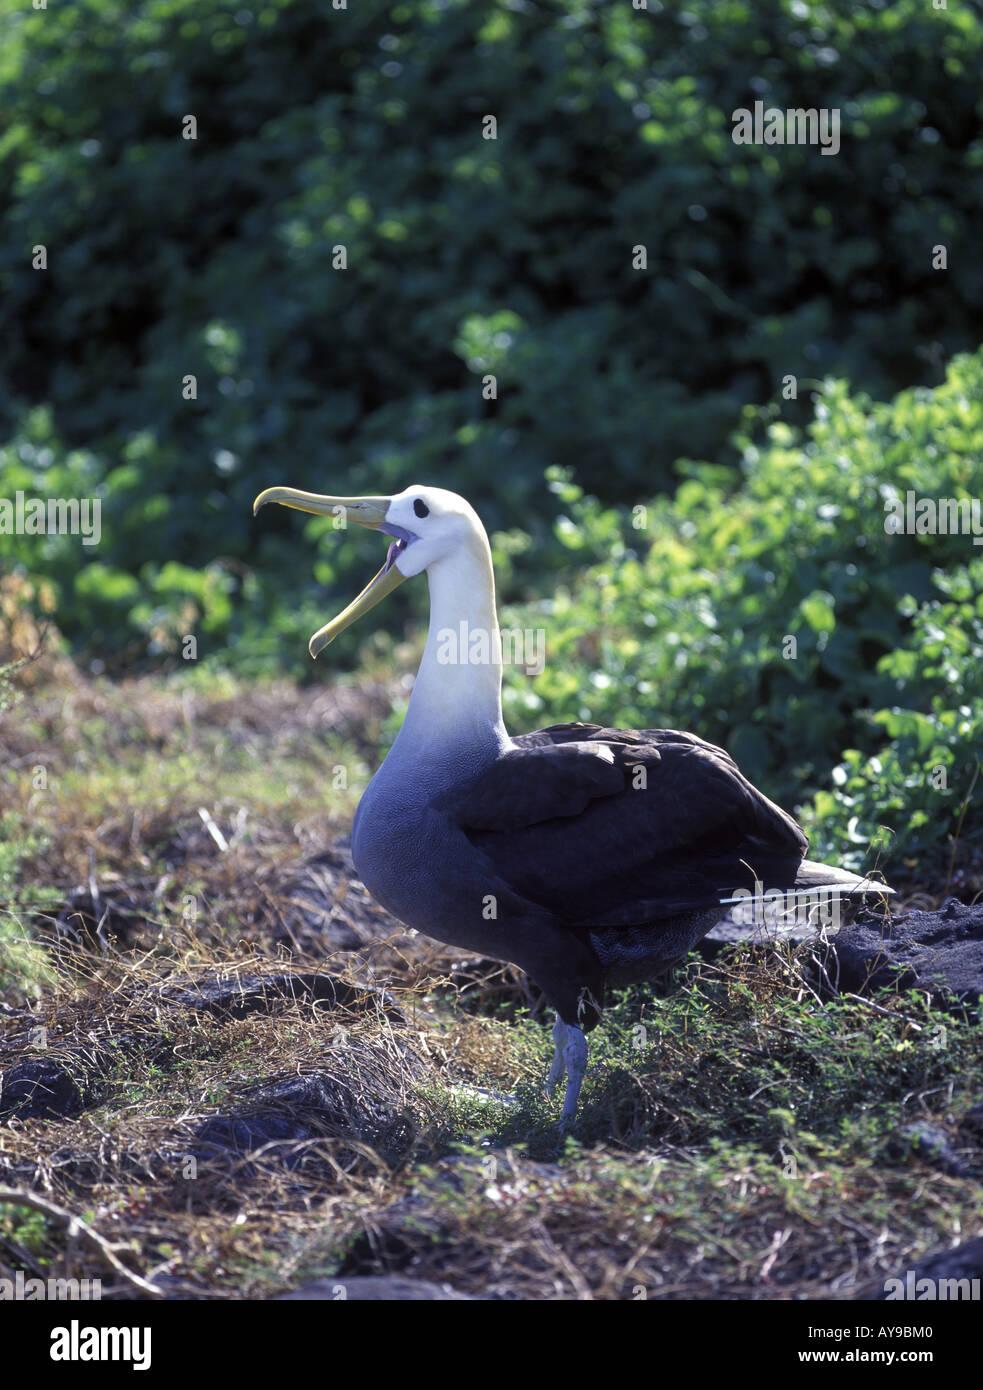 Waved Albatross Diomedea irrorata Calling Espanola Island Galapagos 250th f4 300mm - Stock Image